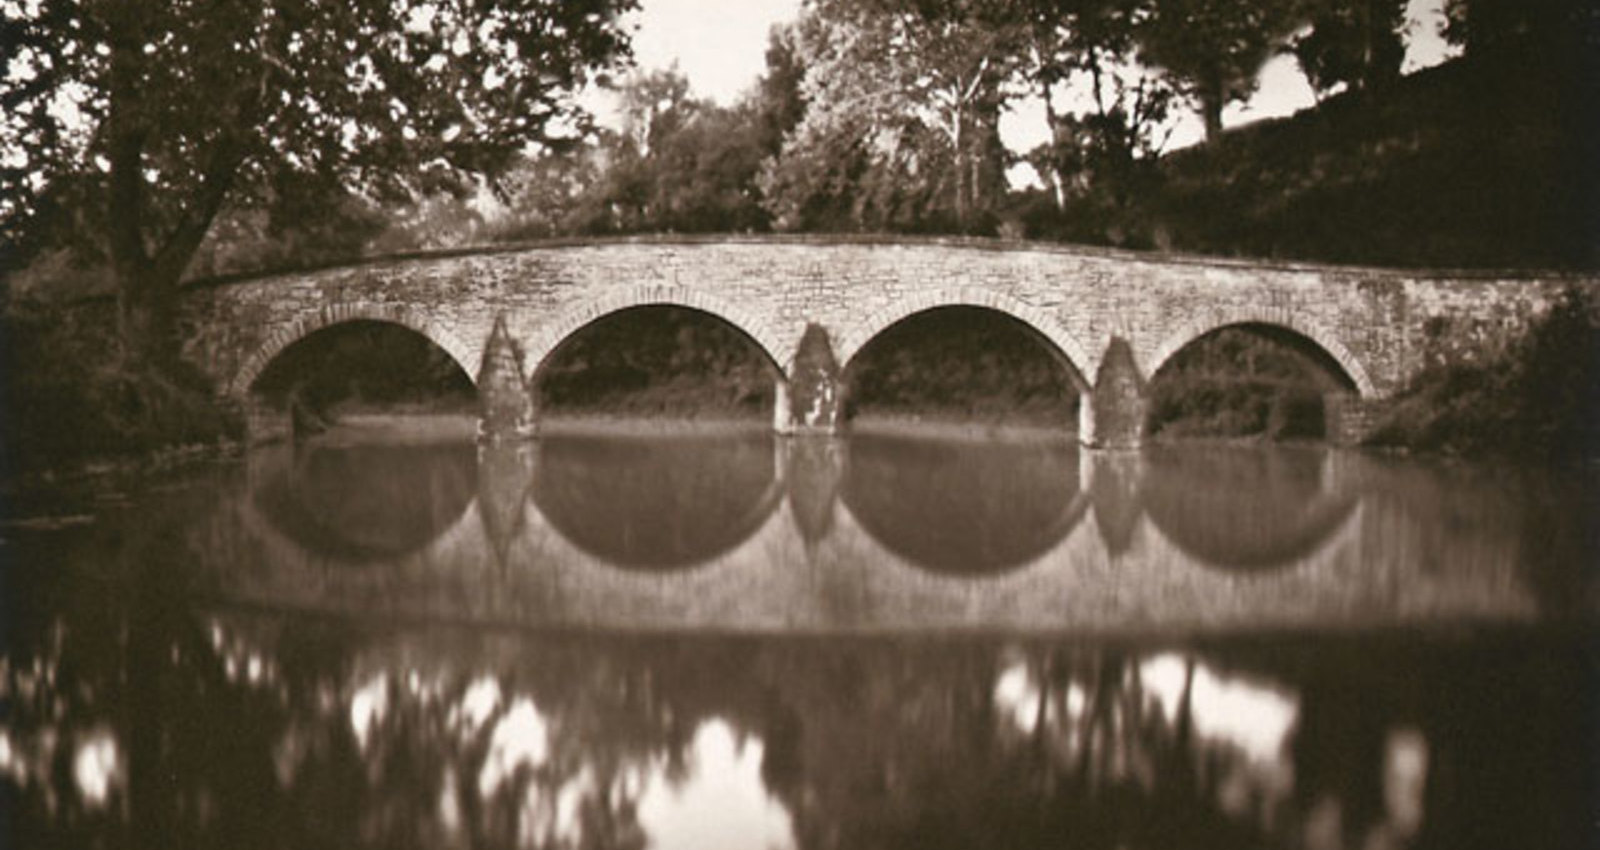 Bridge, Hay, Rowers